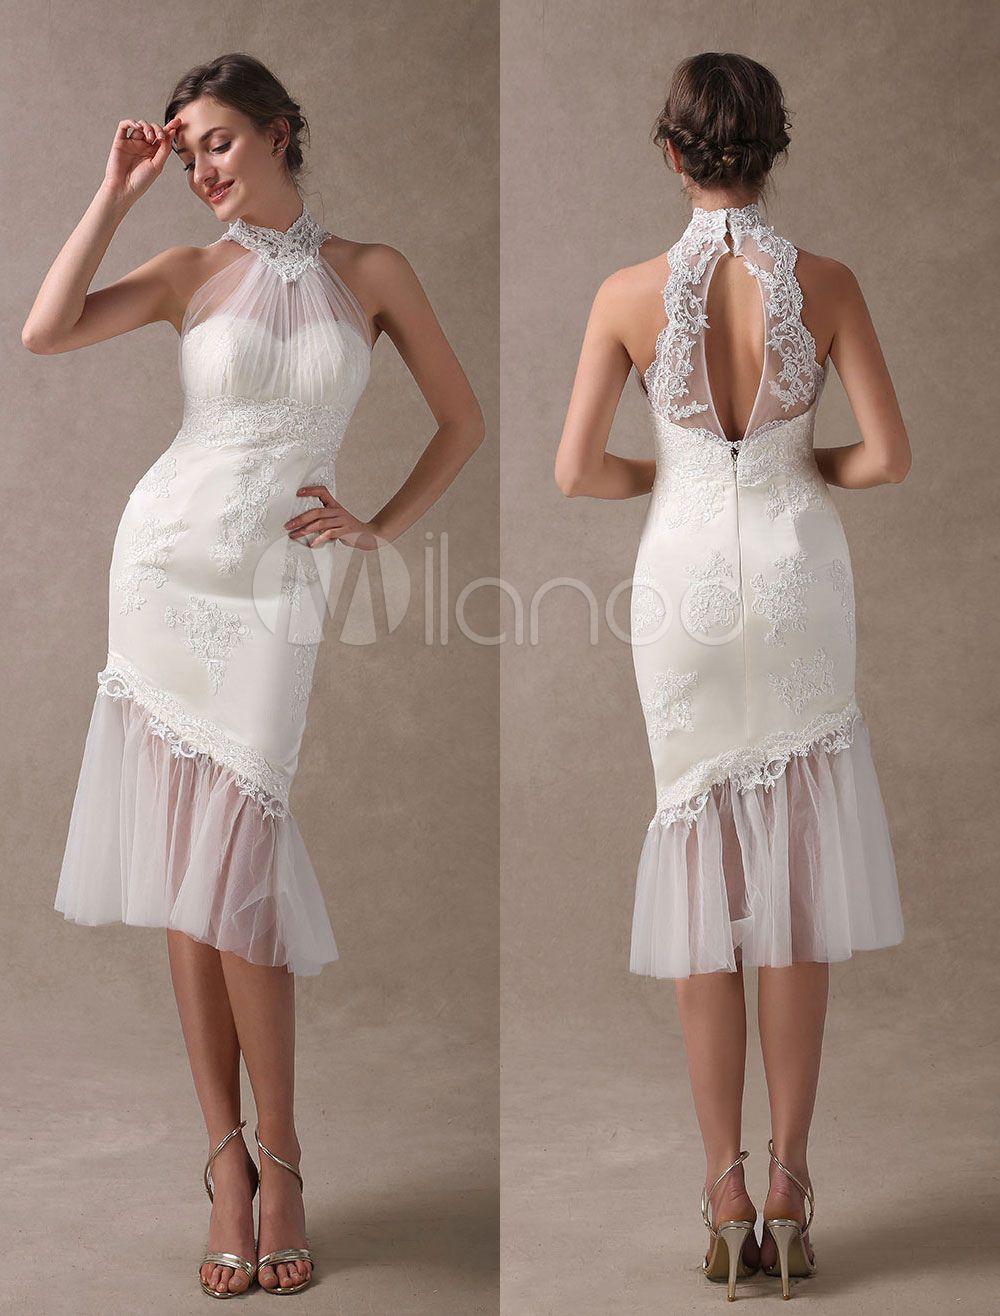 Beach wedding dresses short mermaid bridal dress halter open back